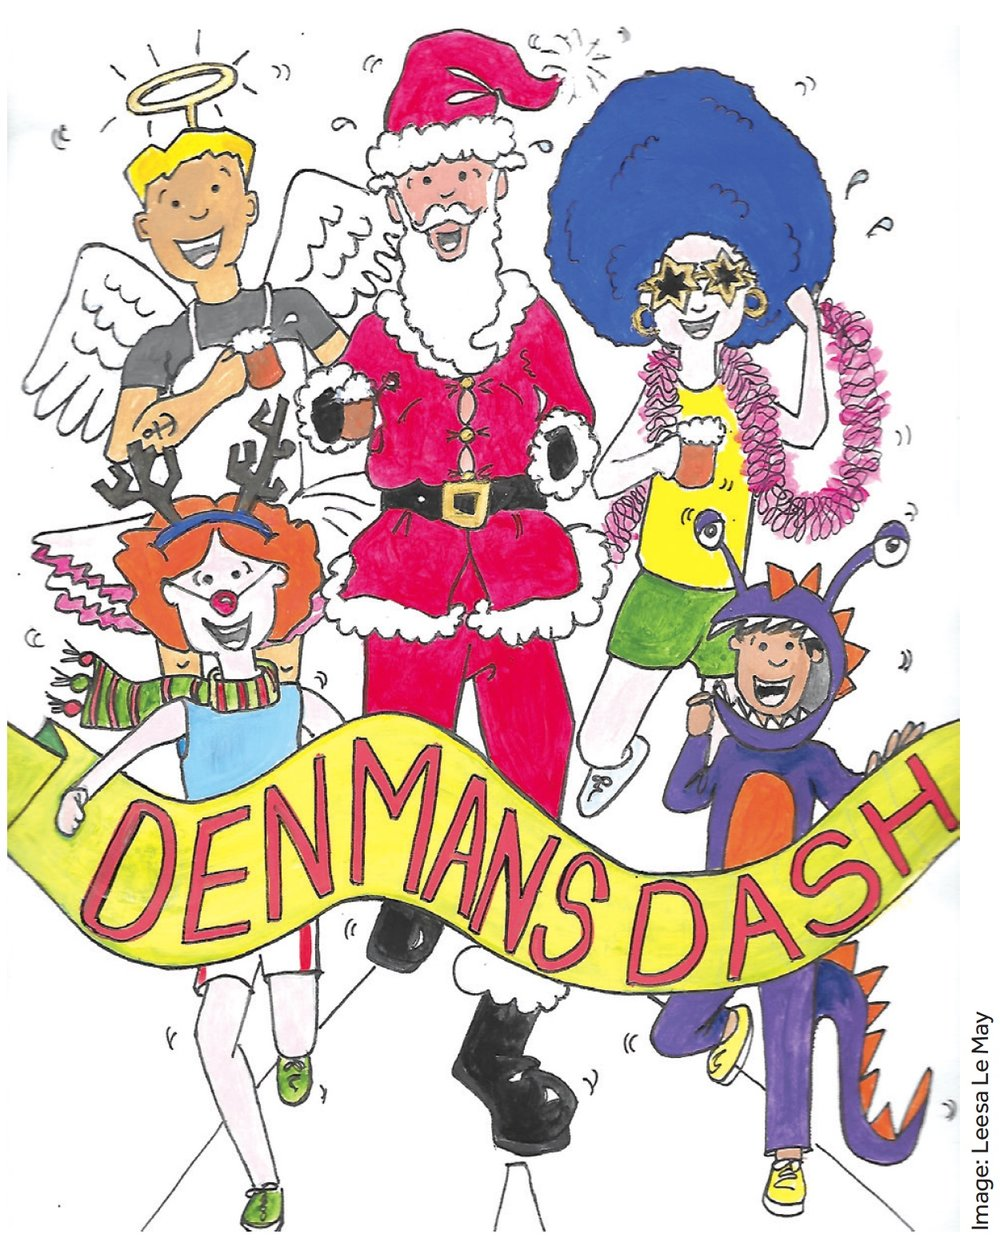 Denmans Lane Dash Poster 2018